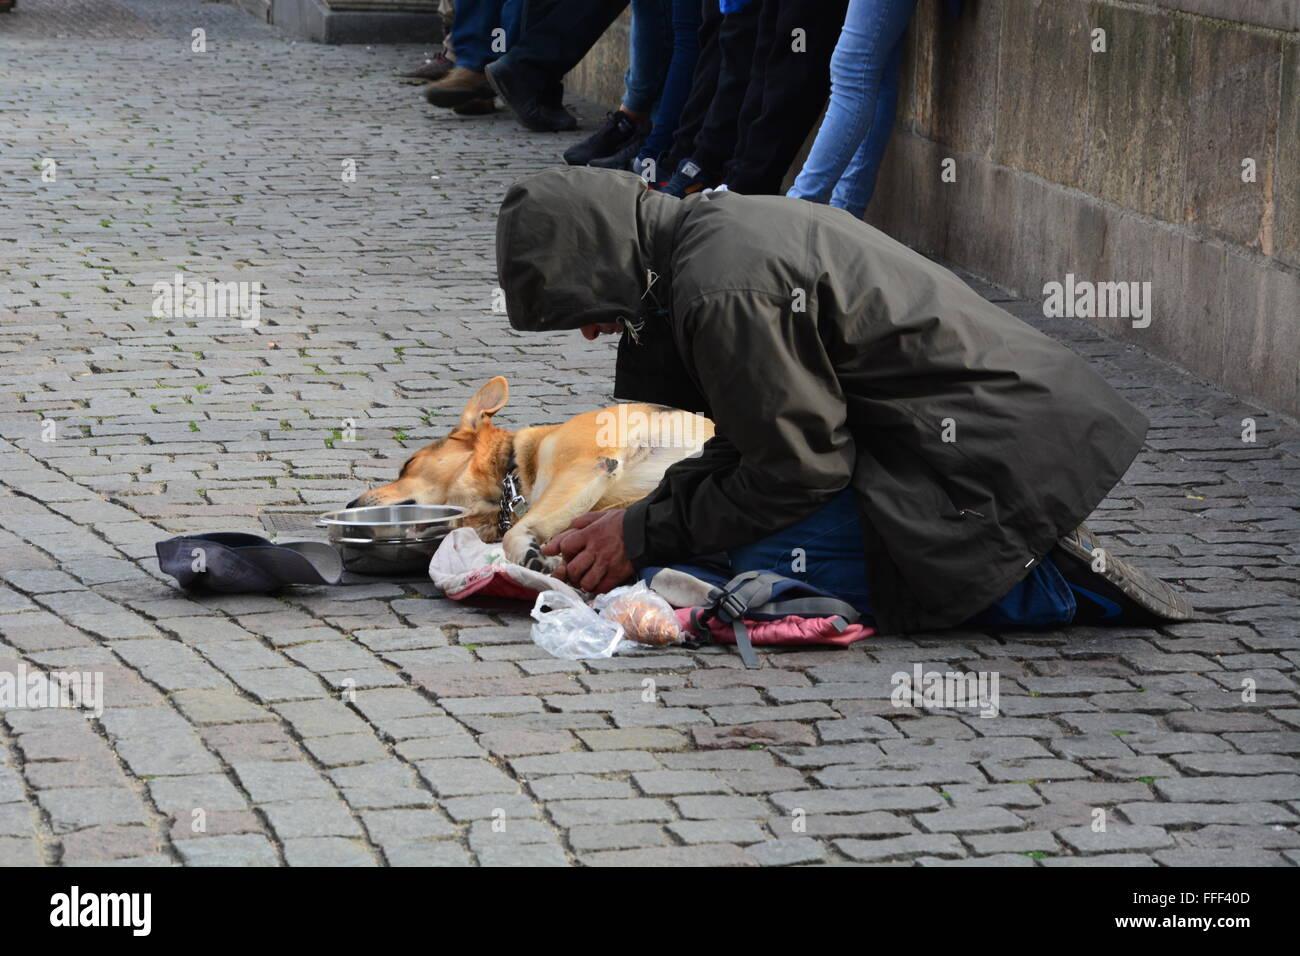 Street beggar with dog on the Charles Bridge in Prague, Czech Republic. - Stock Image